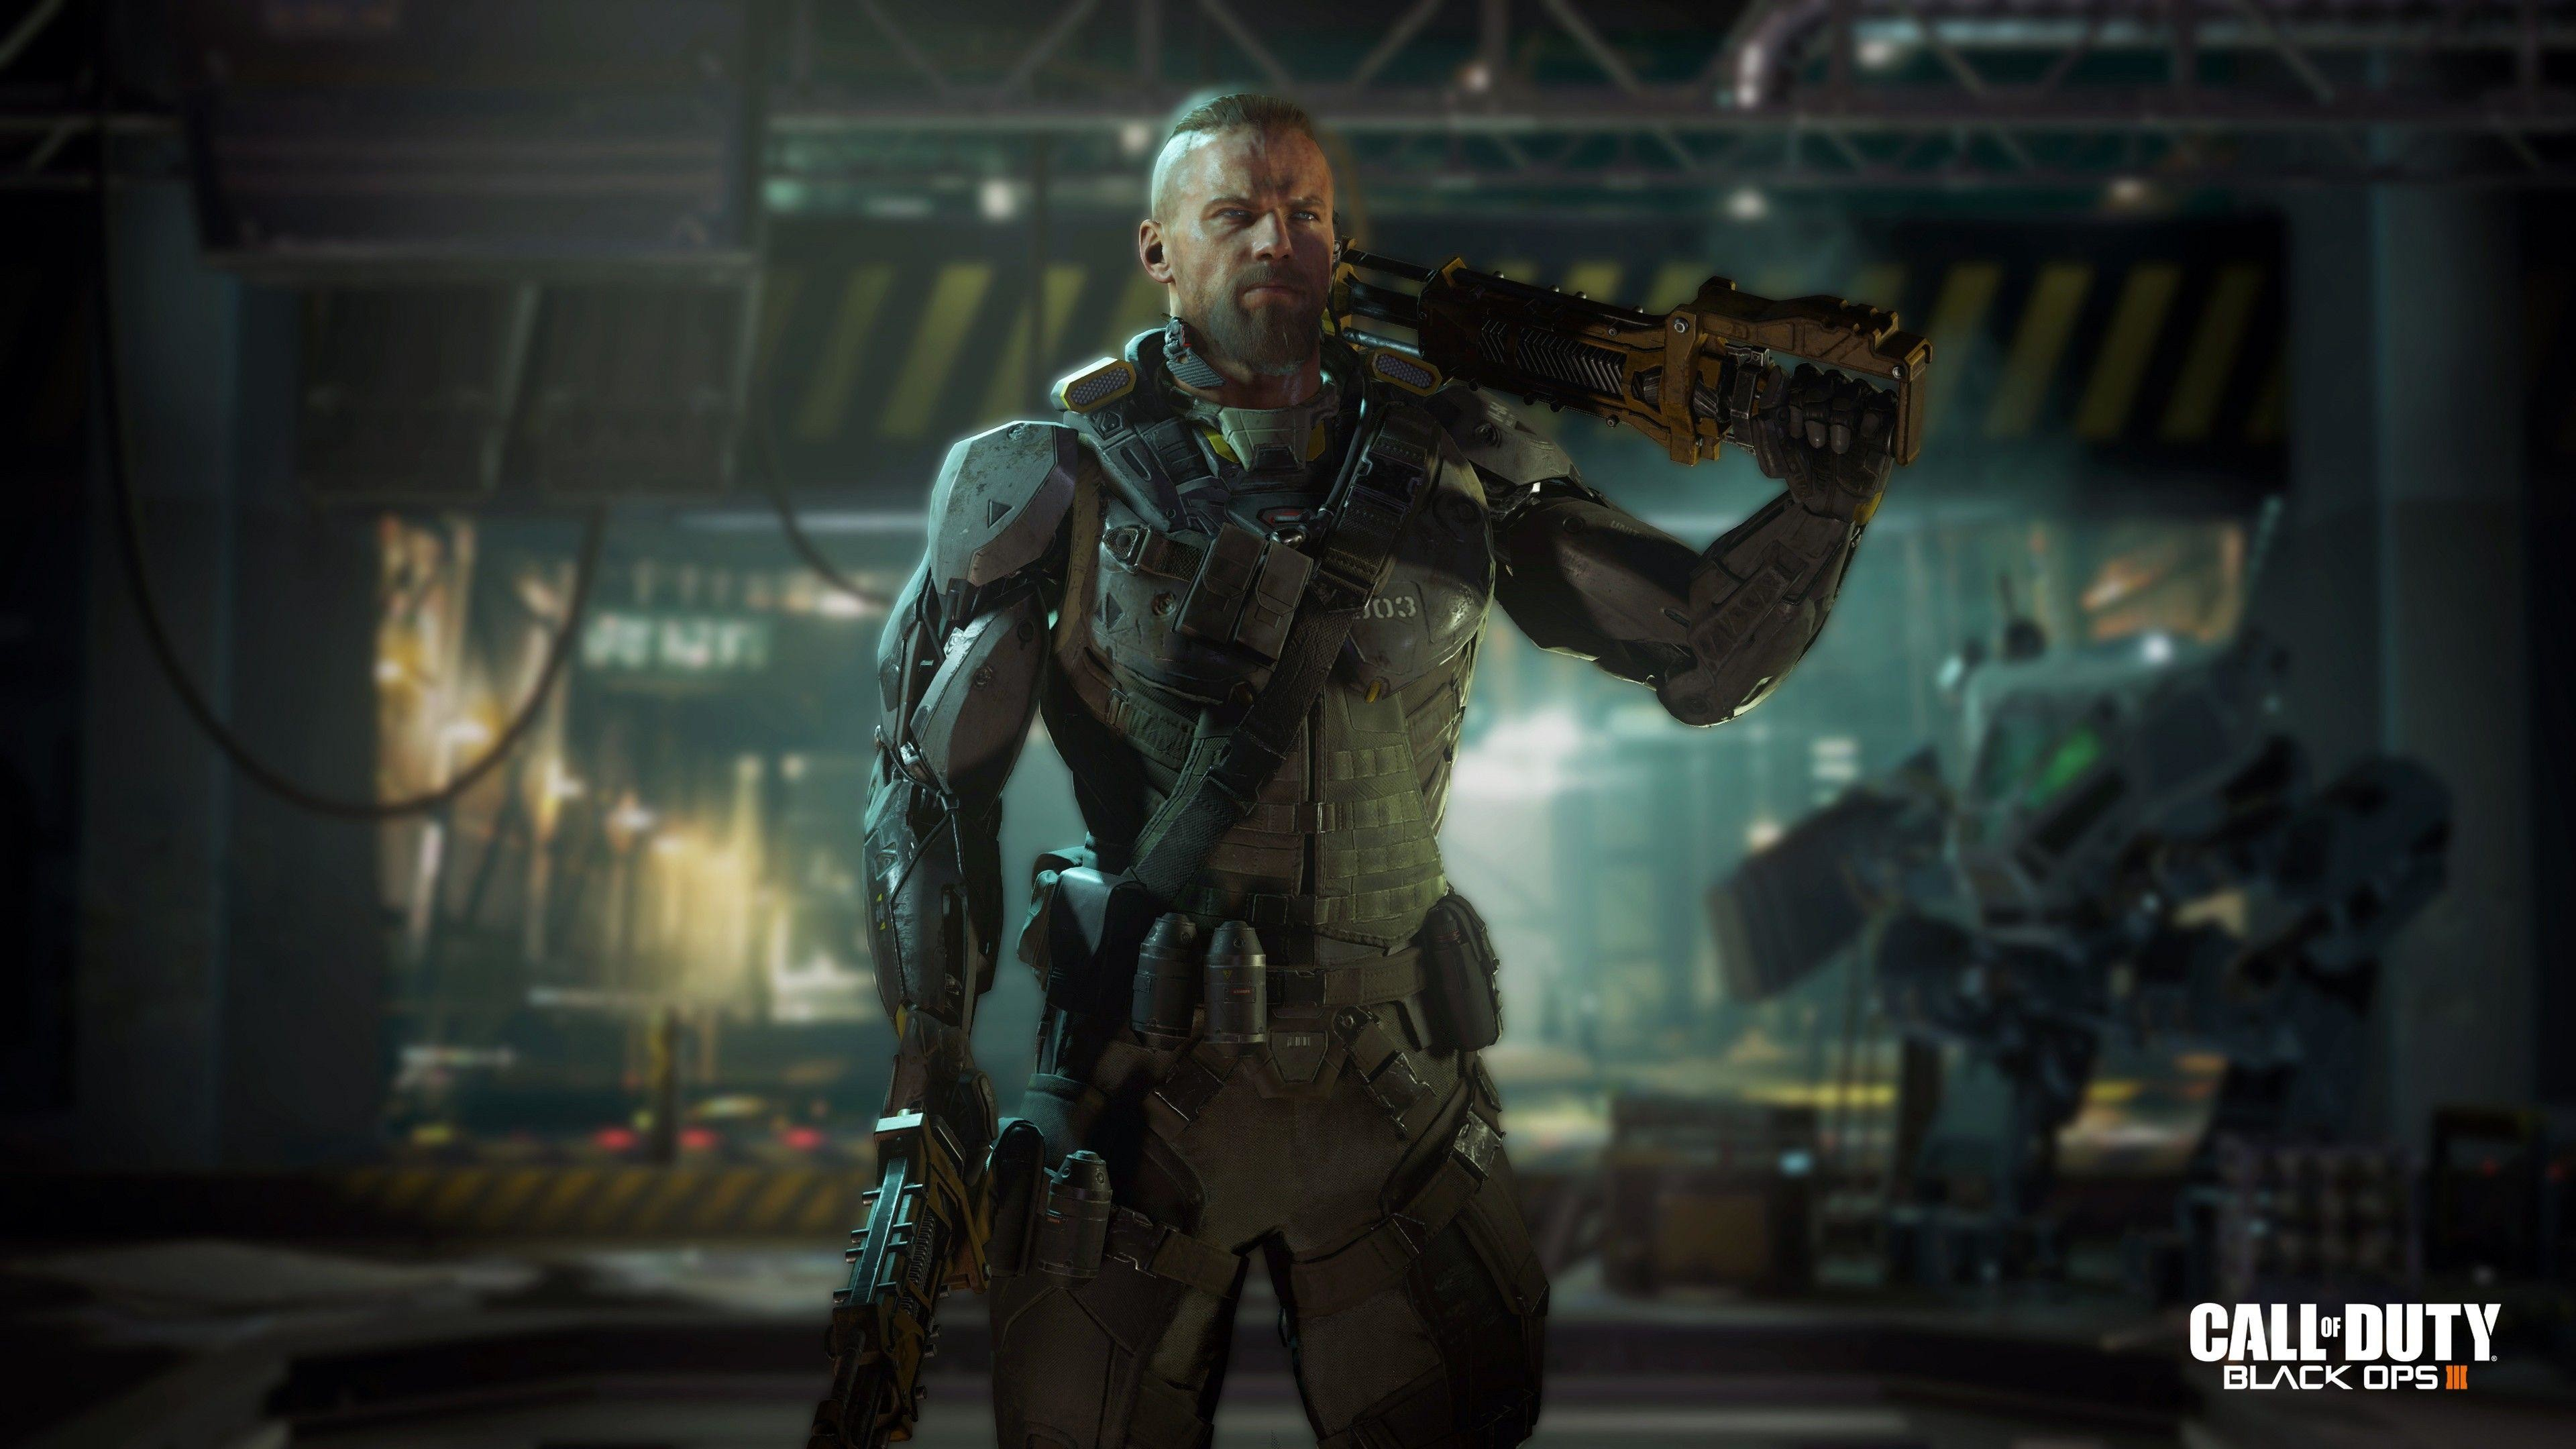 Call Of Duty Black Ops 3 Wallpaper #24225 Wallpaper | Download HD .